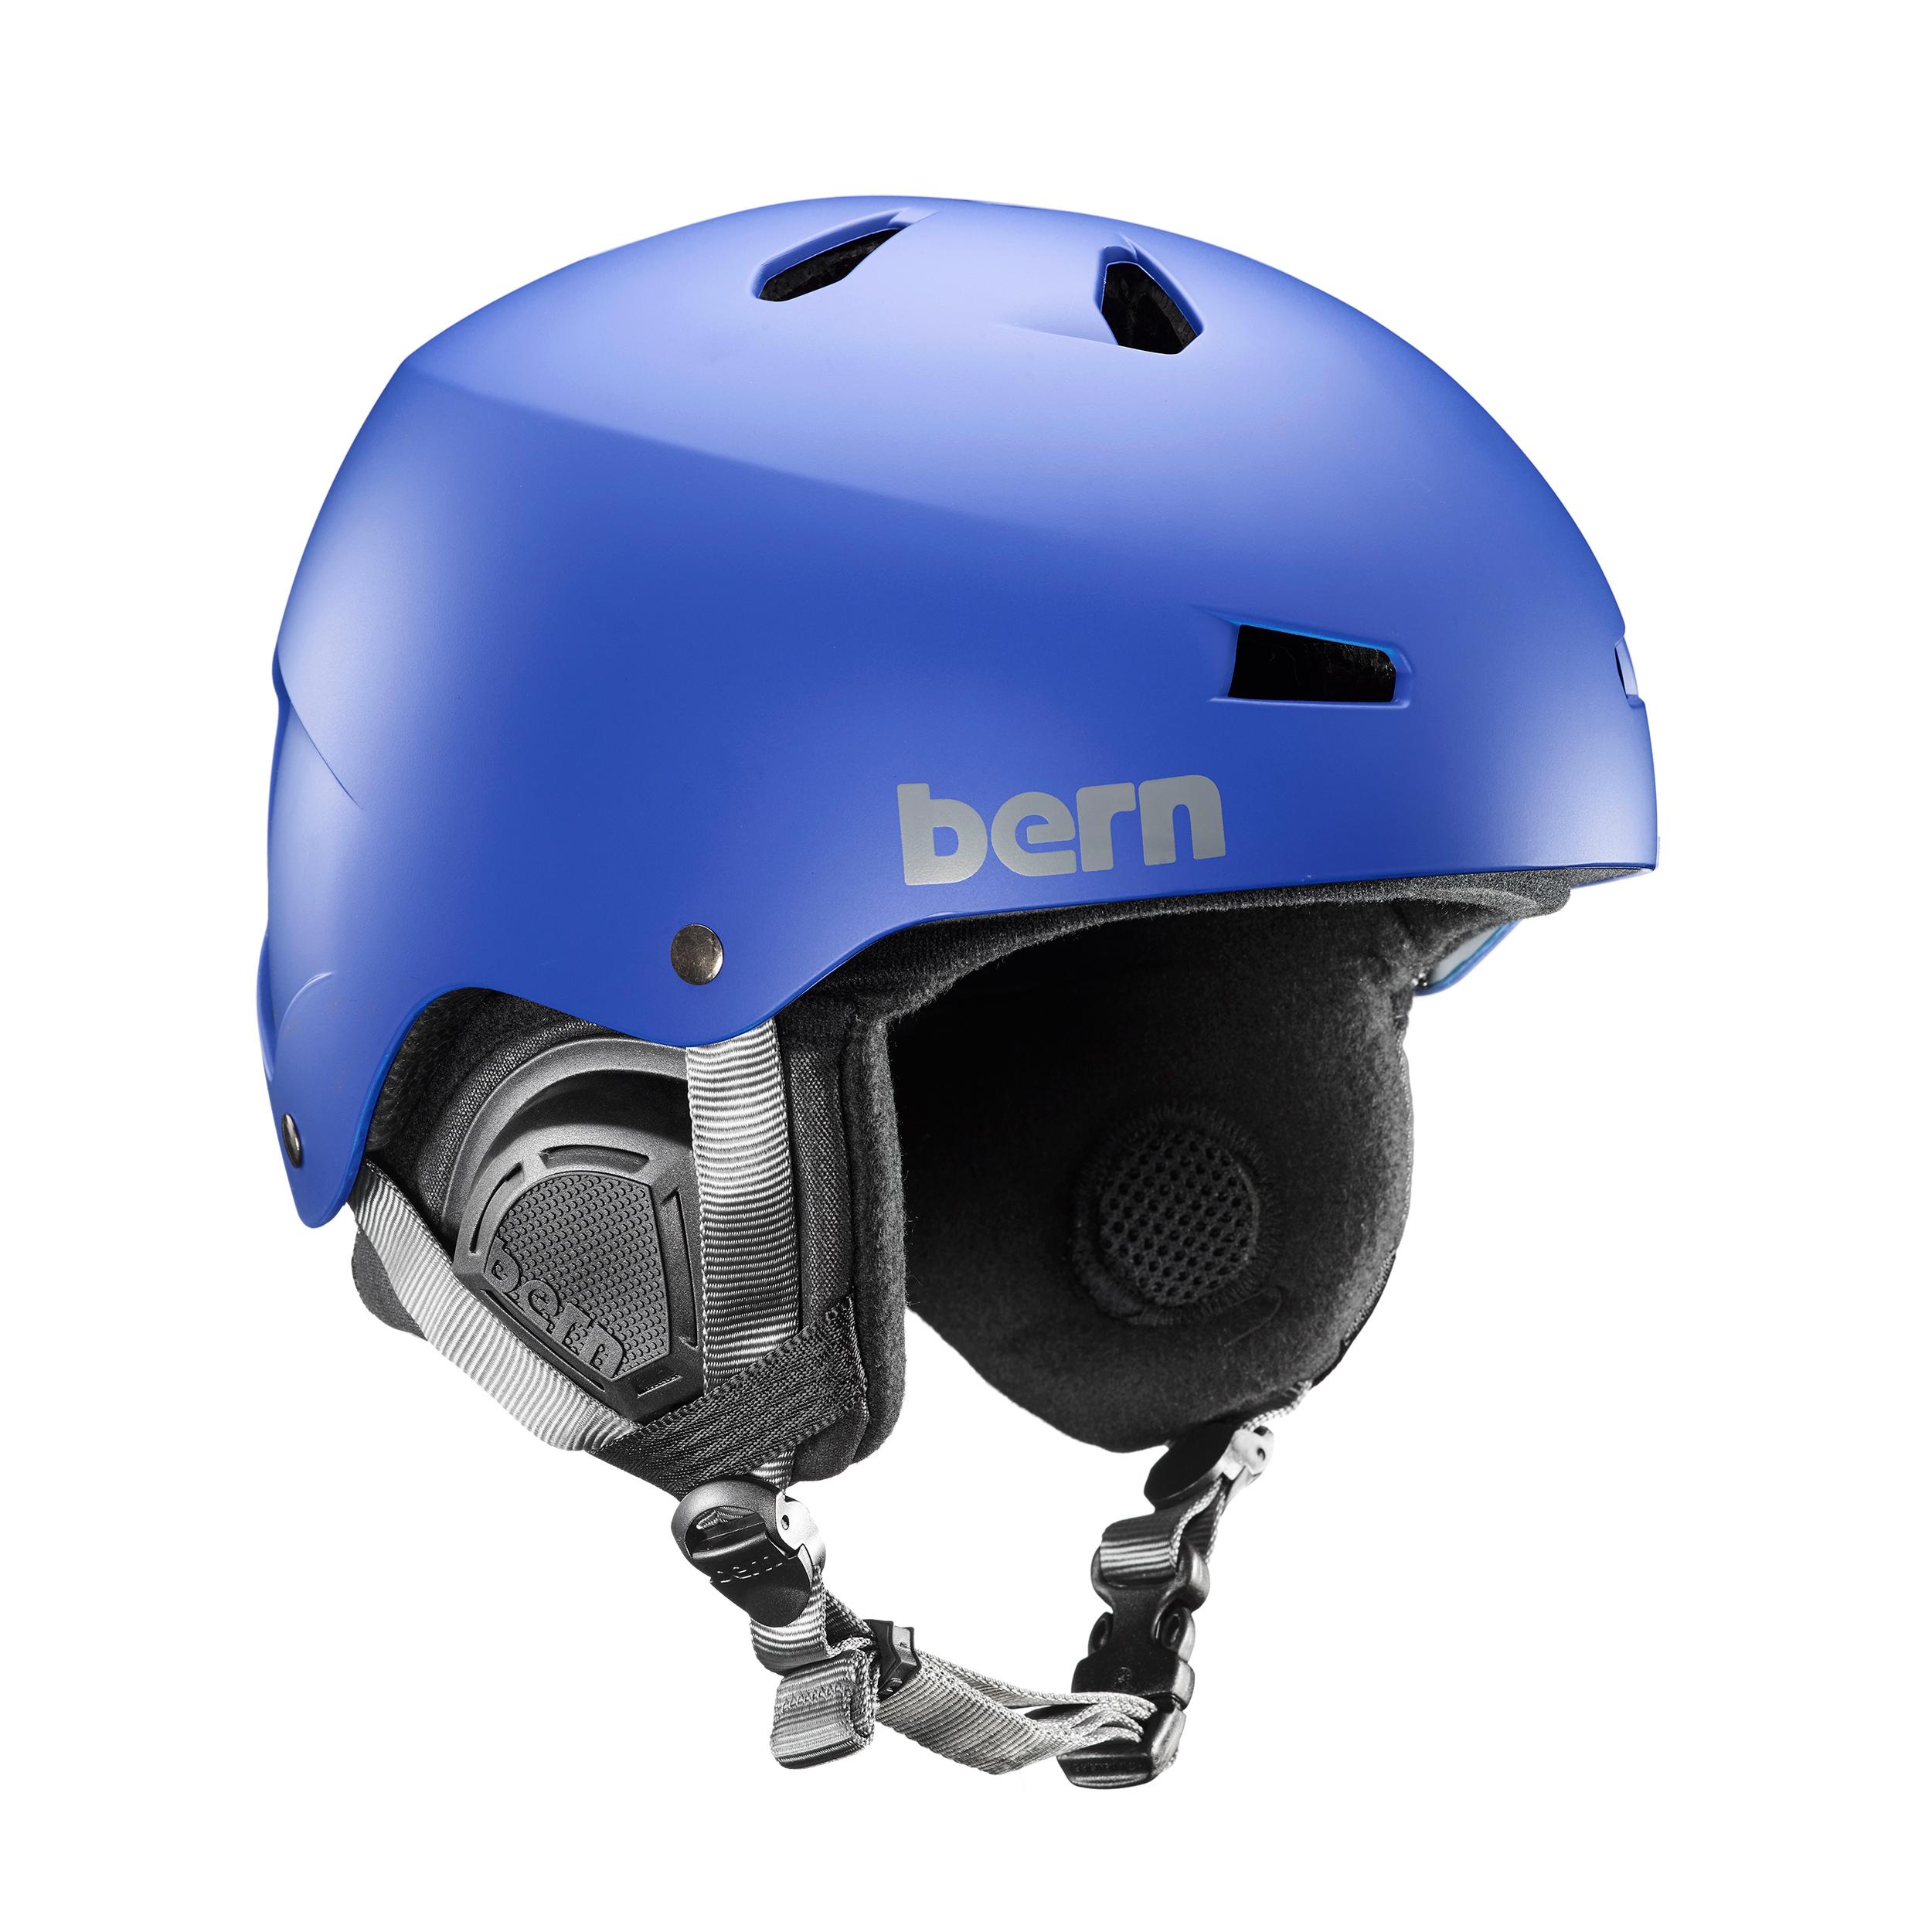 bern macon ski helmet review